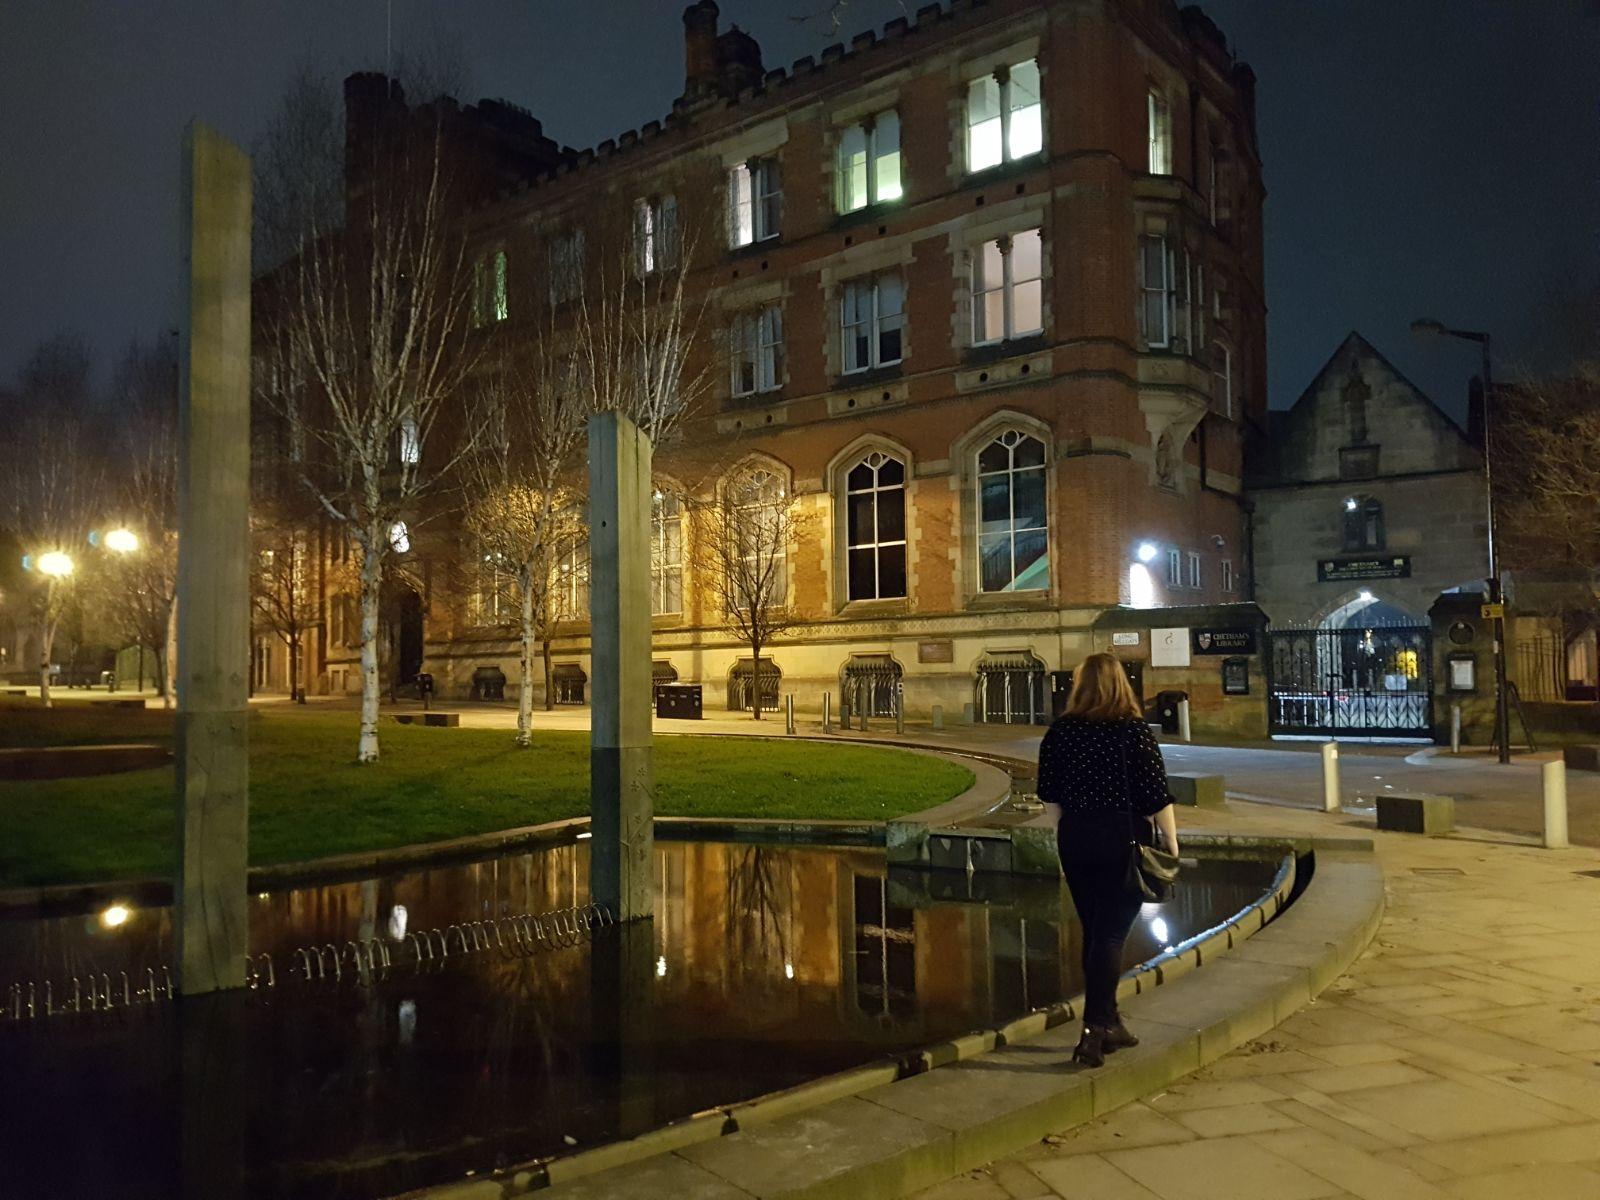 Chetham's School of Music at night